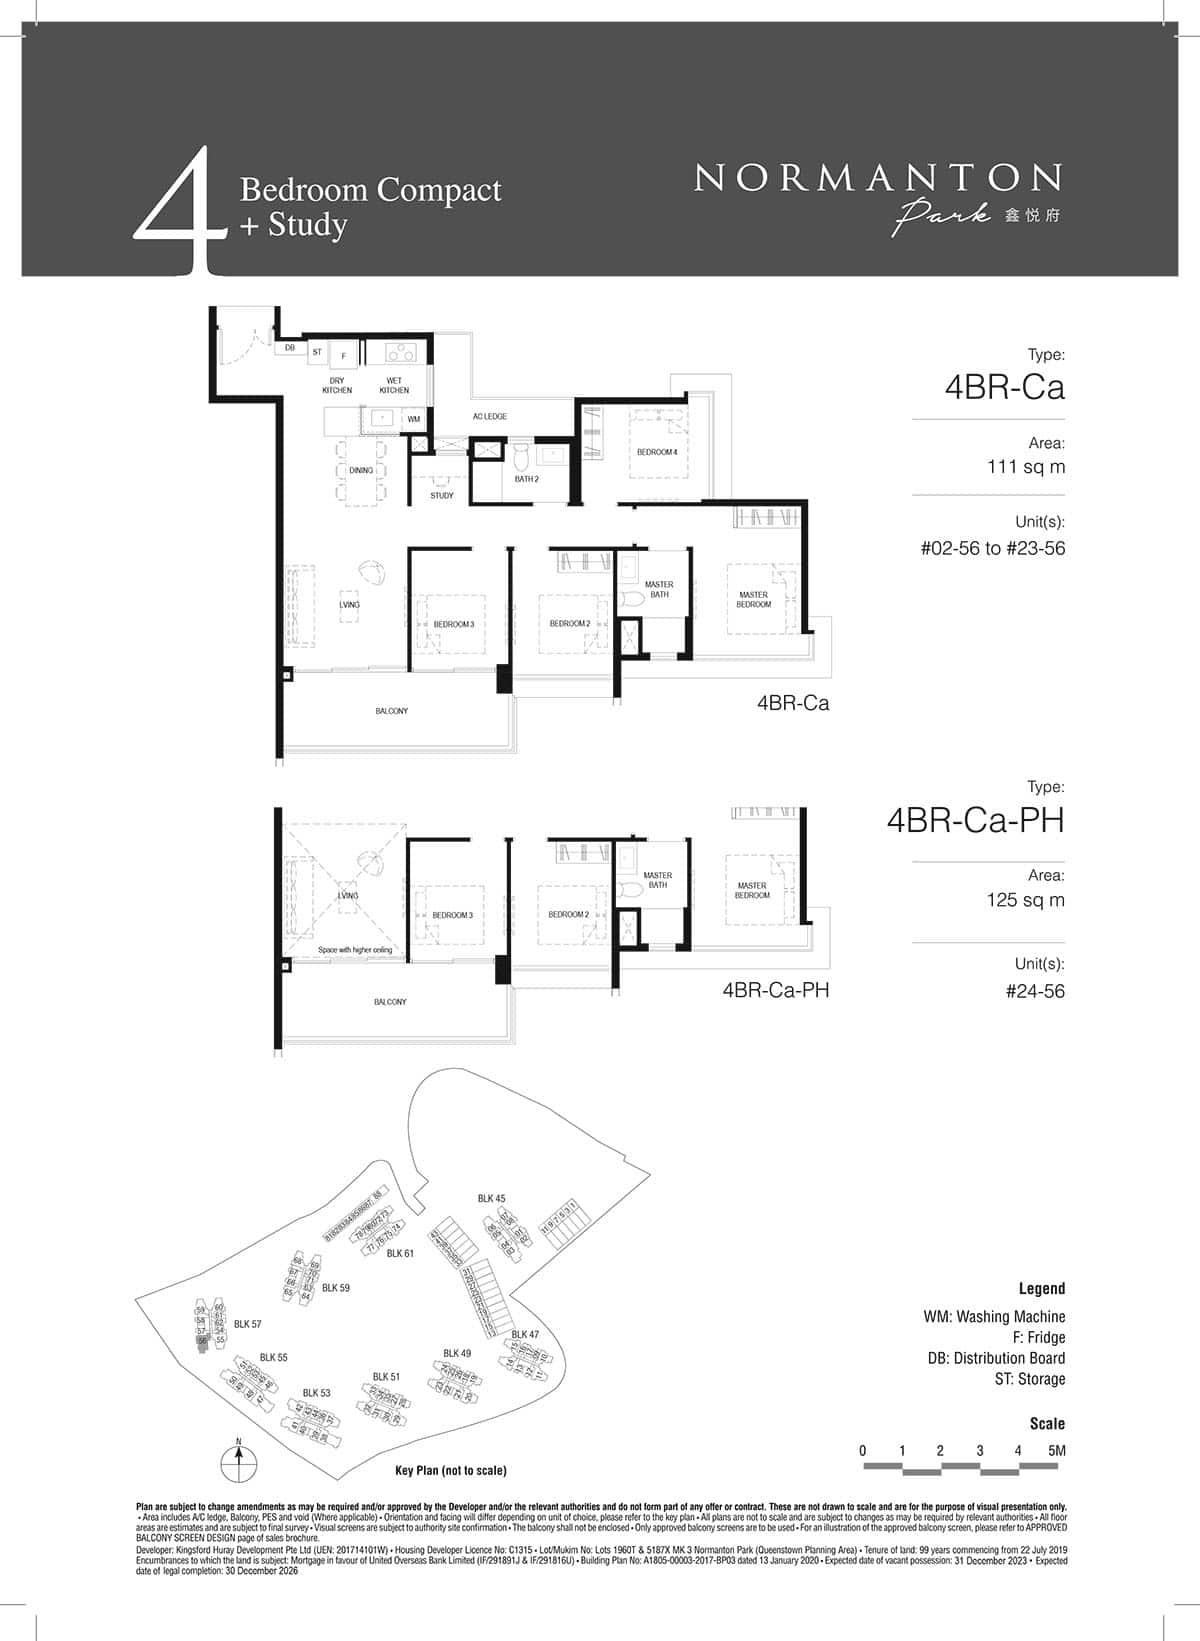 normanton park floor plan